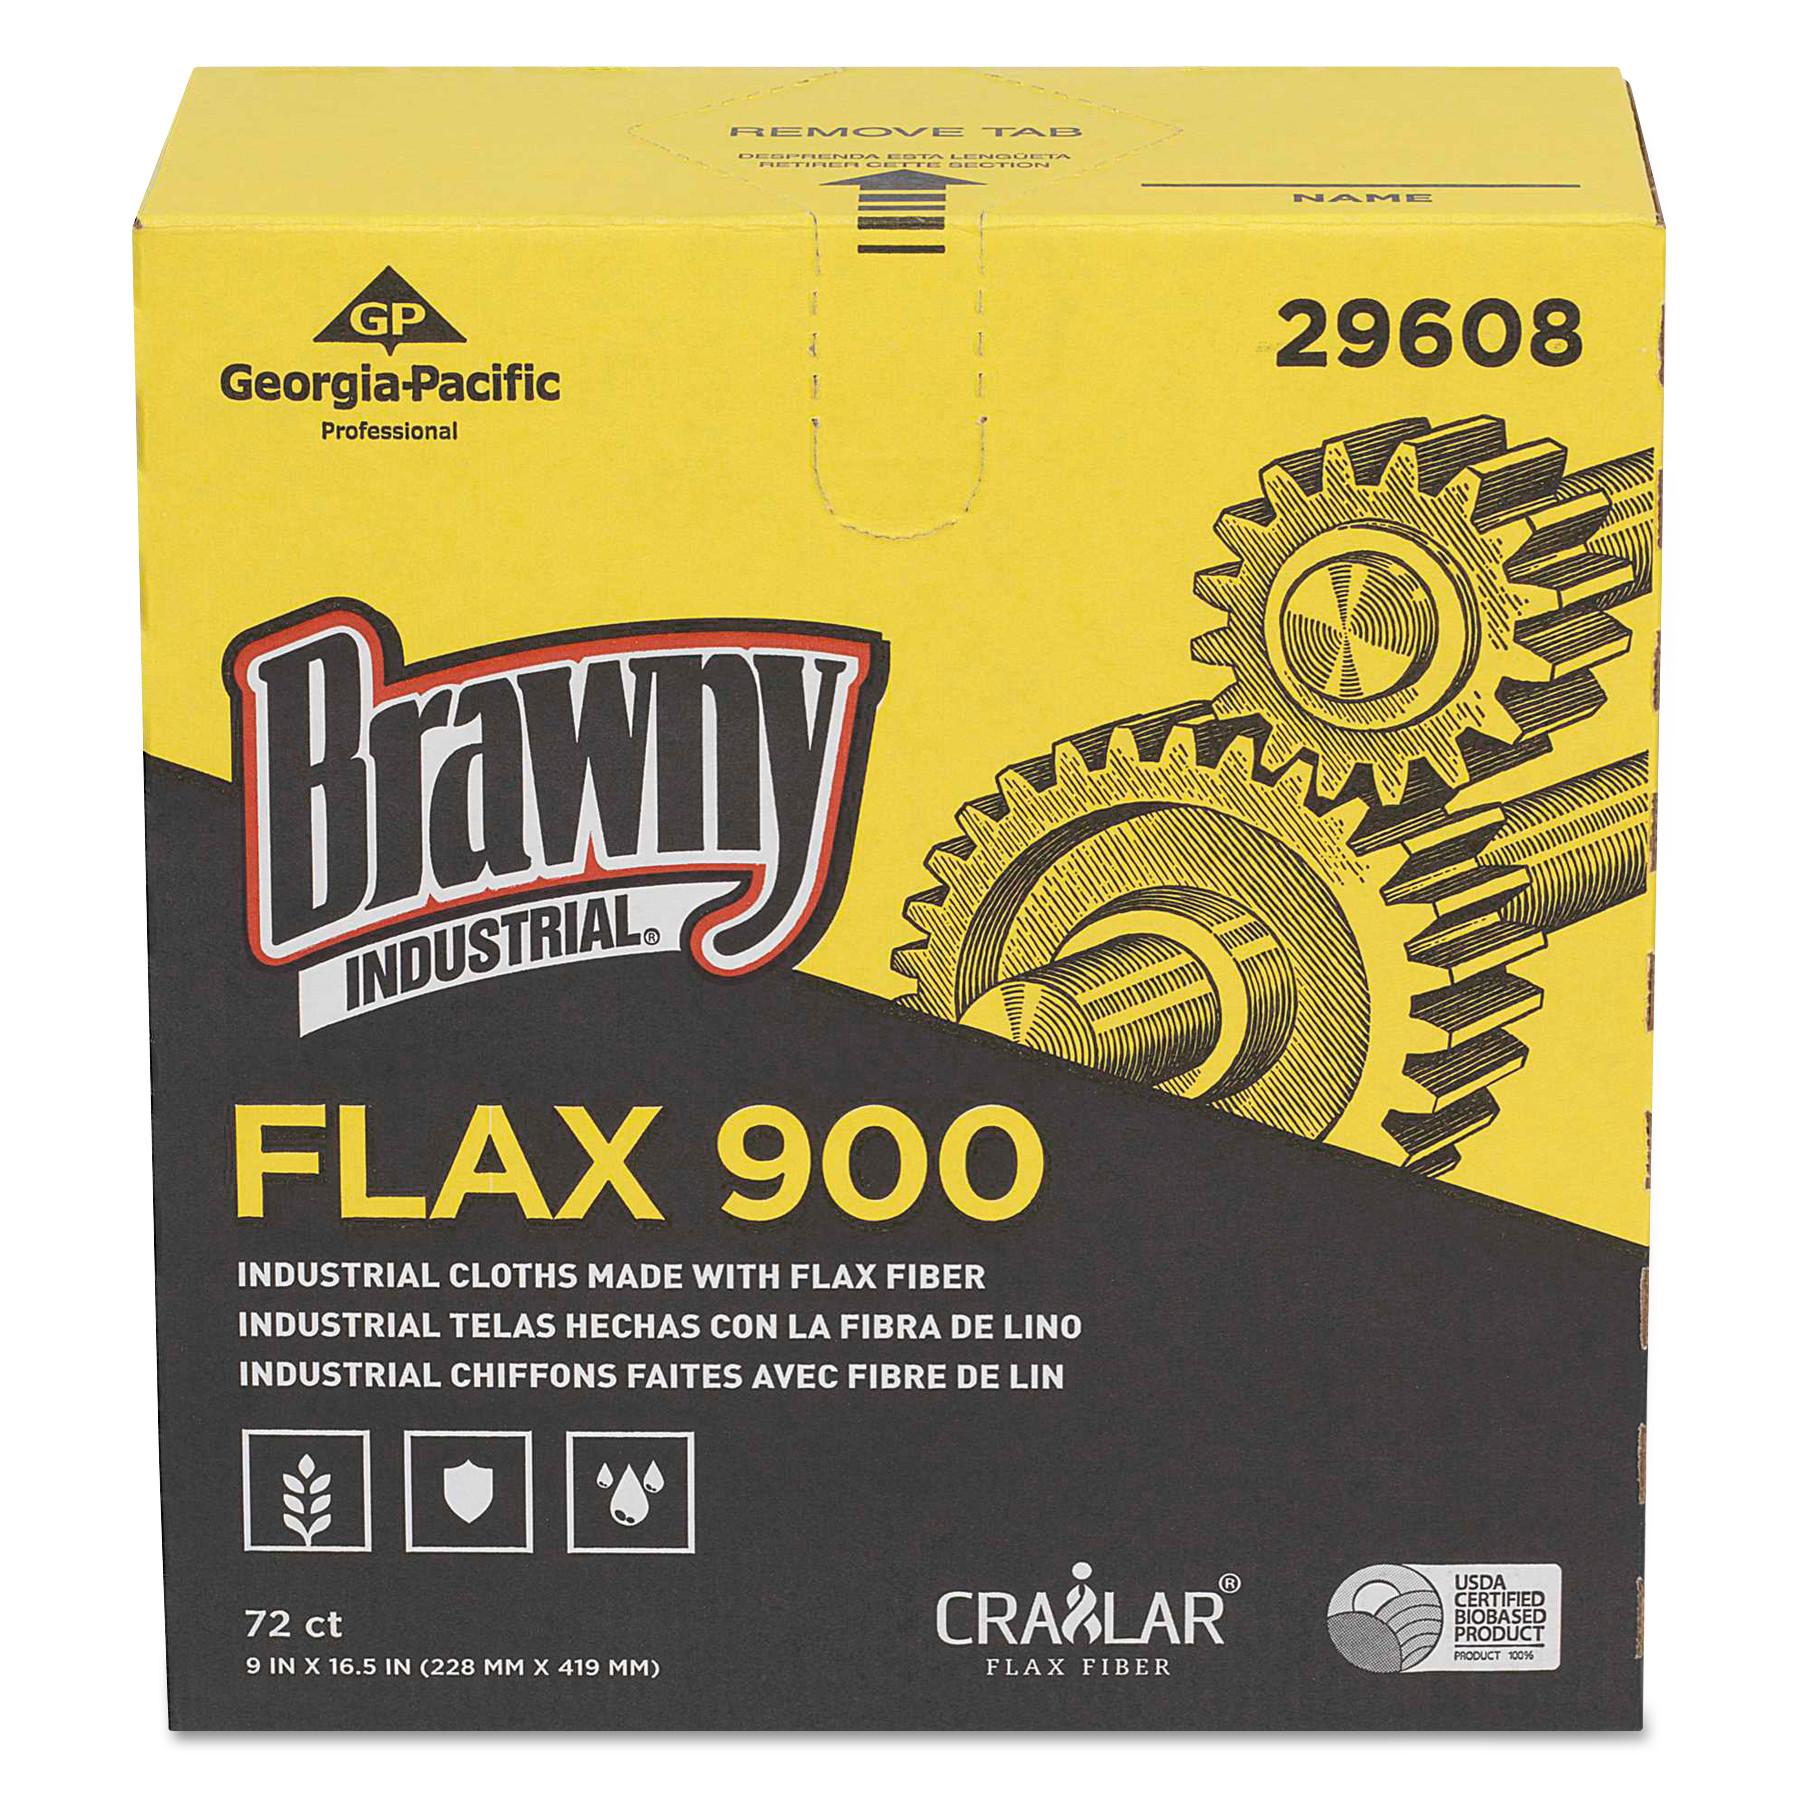 Brawny Industrial FLAX 900 Heavy Duty Cloths, 9 x 16 1/2, White, 72/Box, 10 Box/Carton -GPC29608